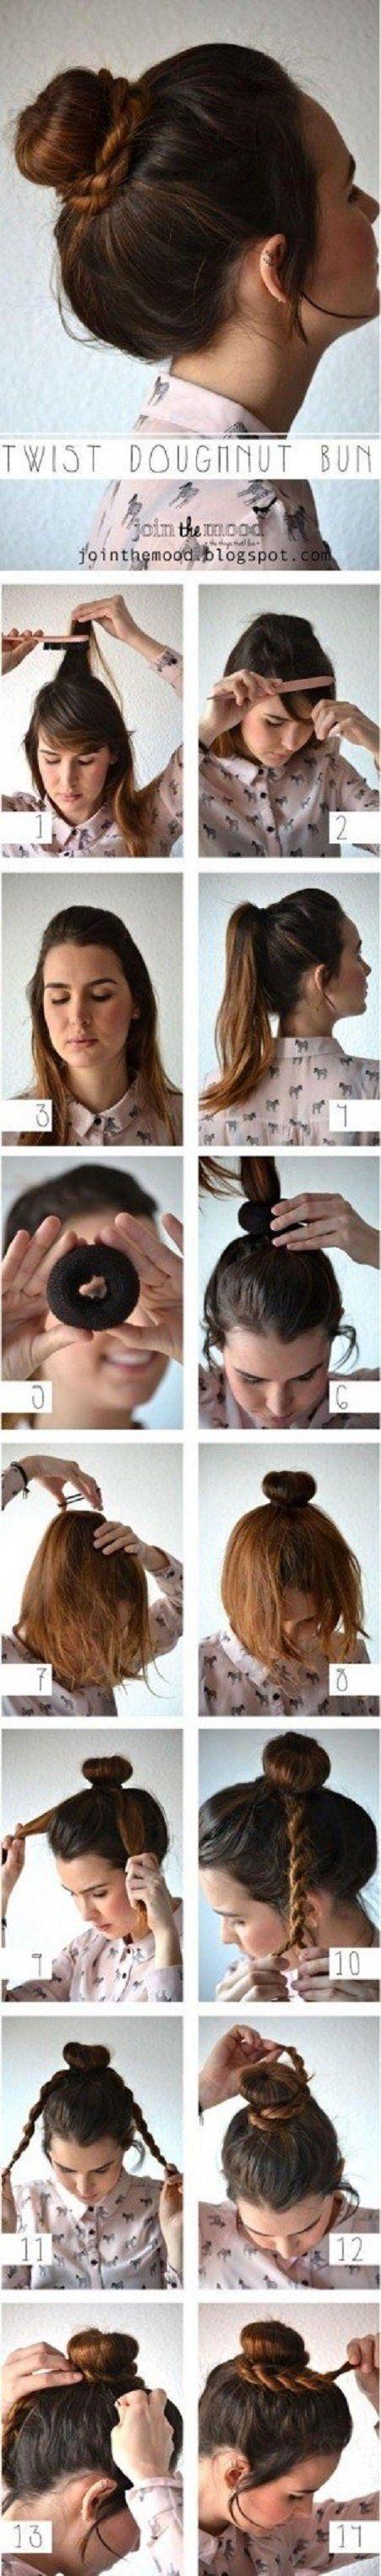 Twist Dougmnut Bun - Hairstyle Tutorial